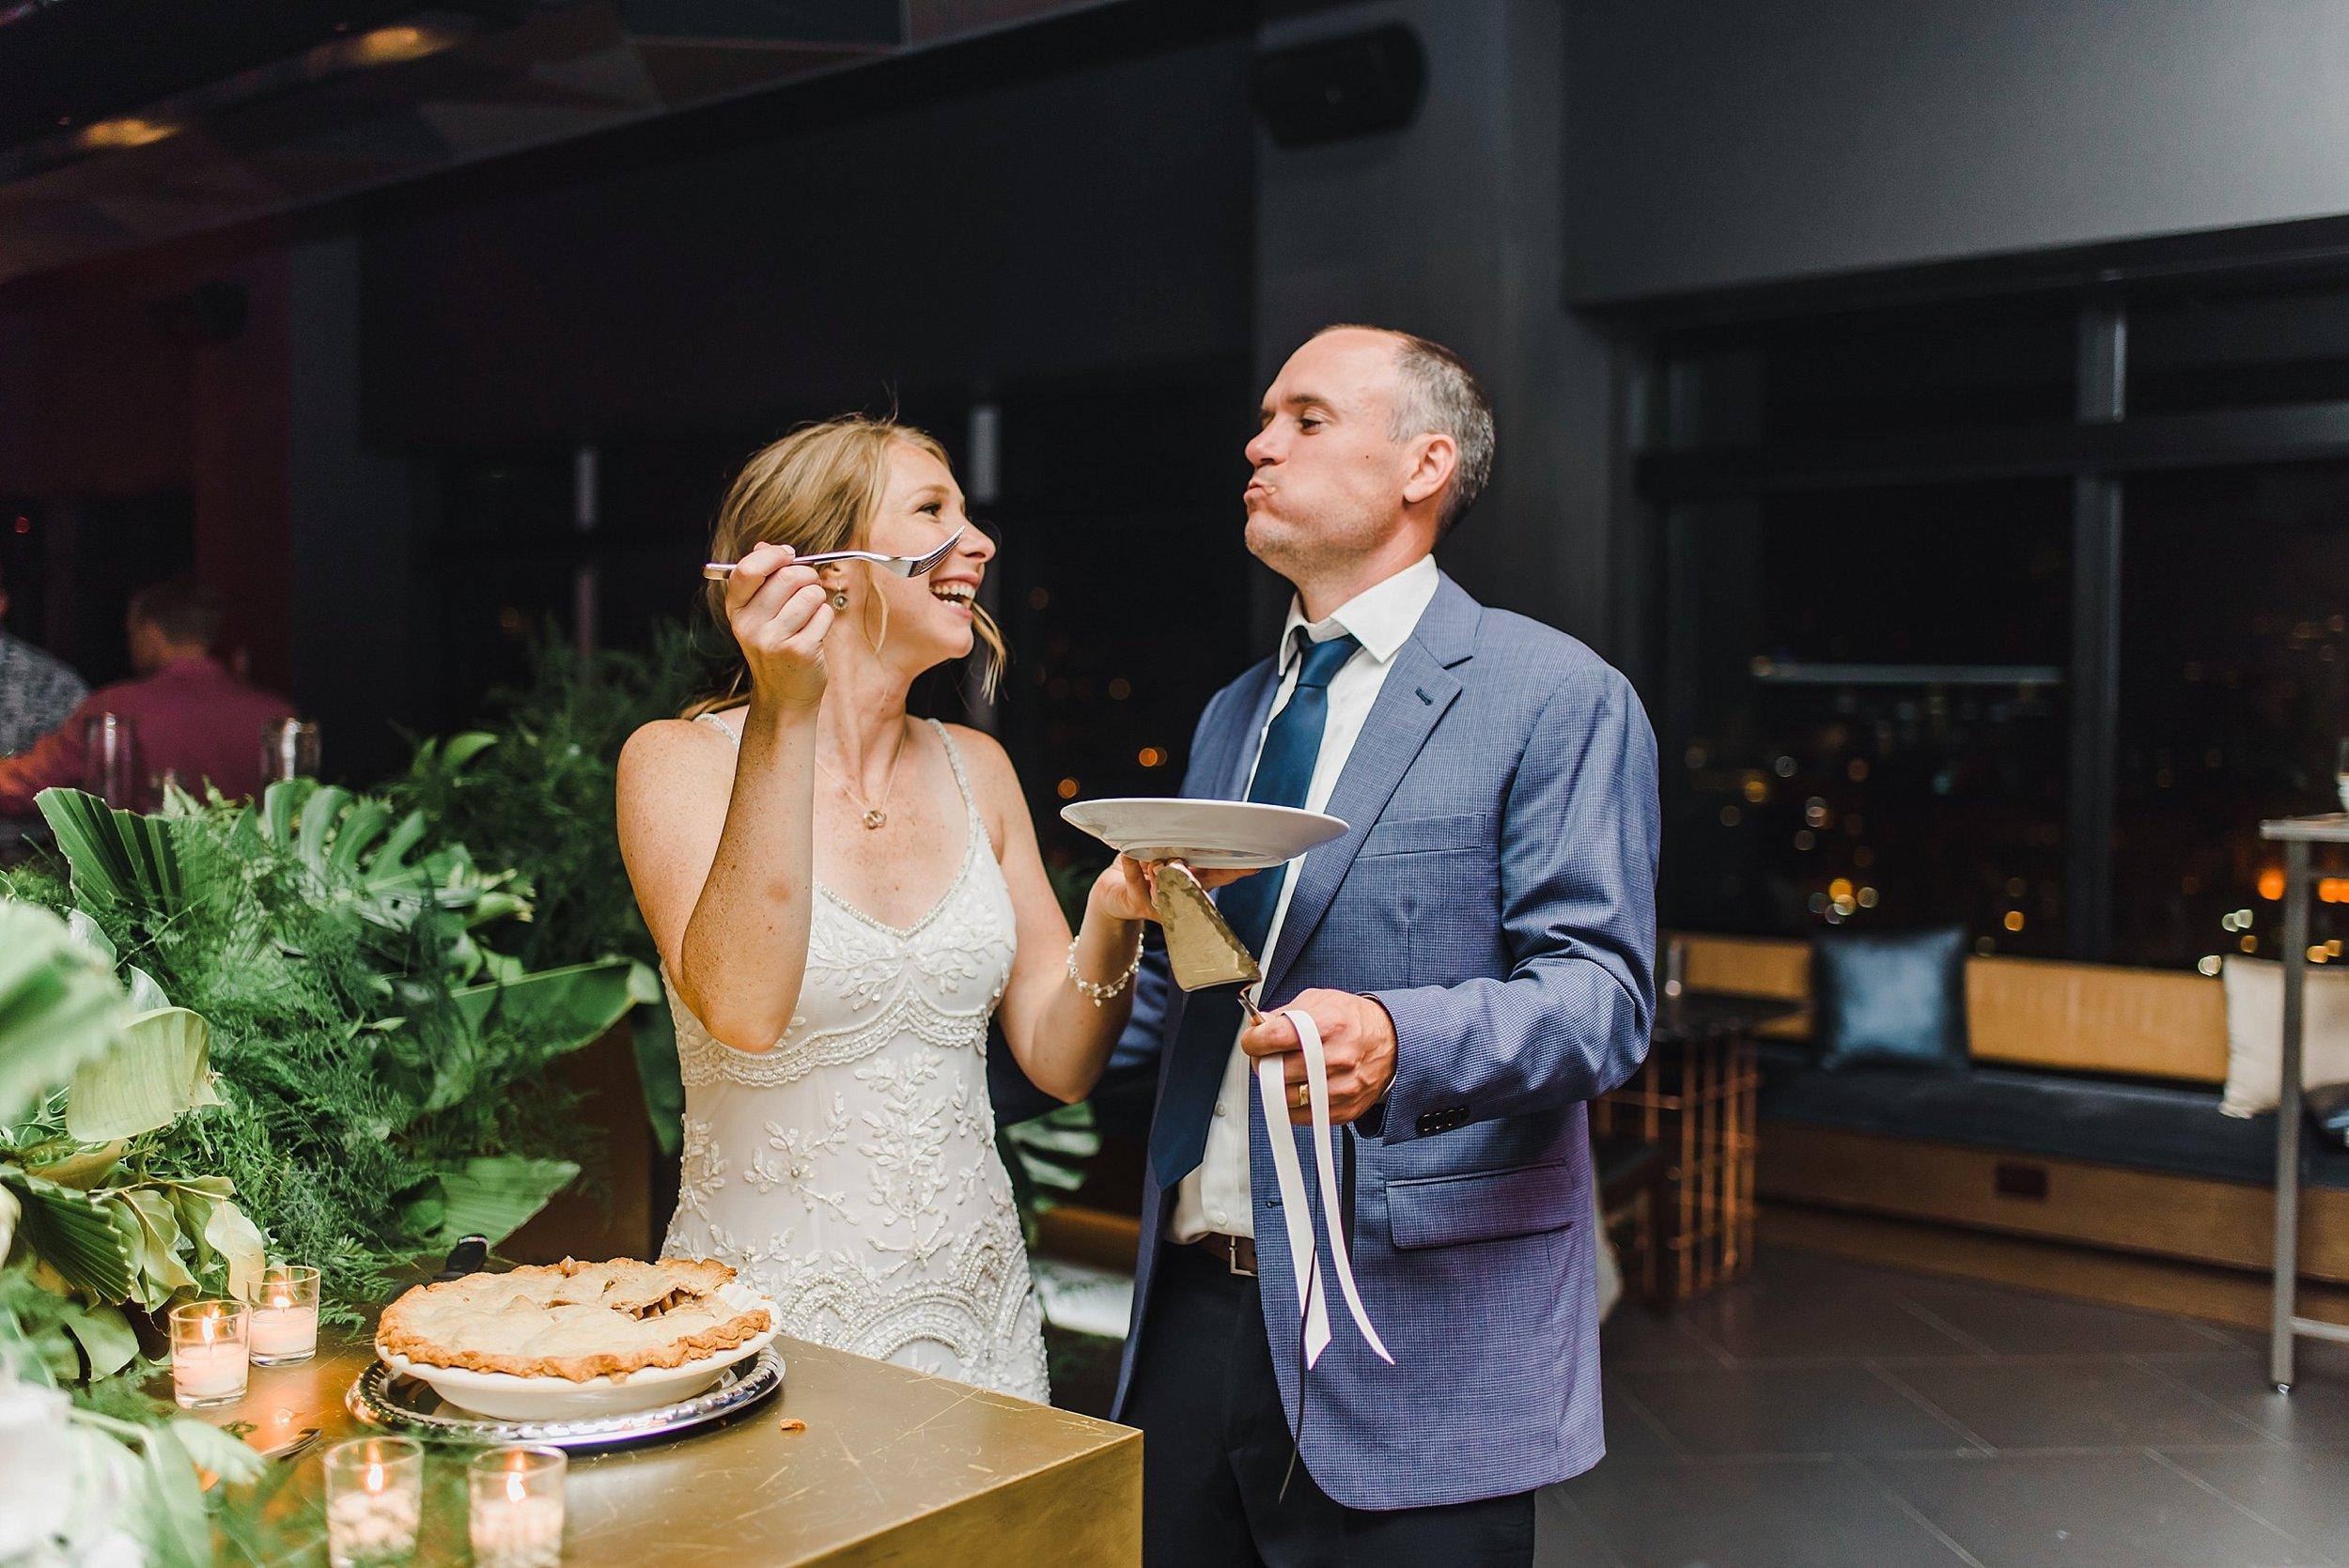 light airy indie fine art ottawa wedding photographer | Ali and Batoul Photography_0715.jpg